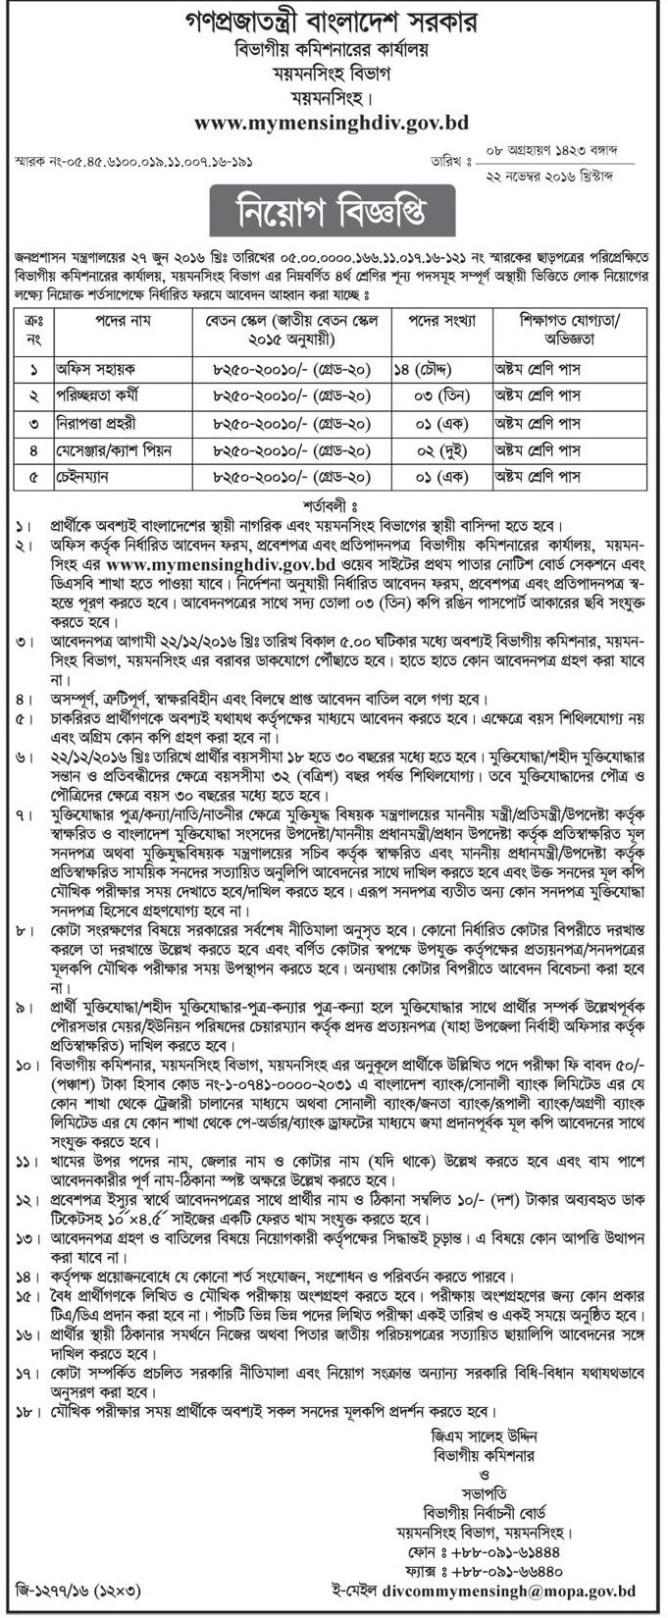 Mymensingh Division Govt Job Circular 2016